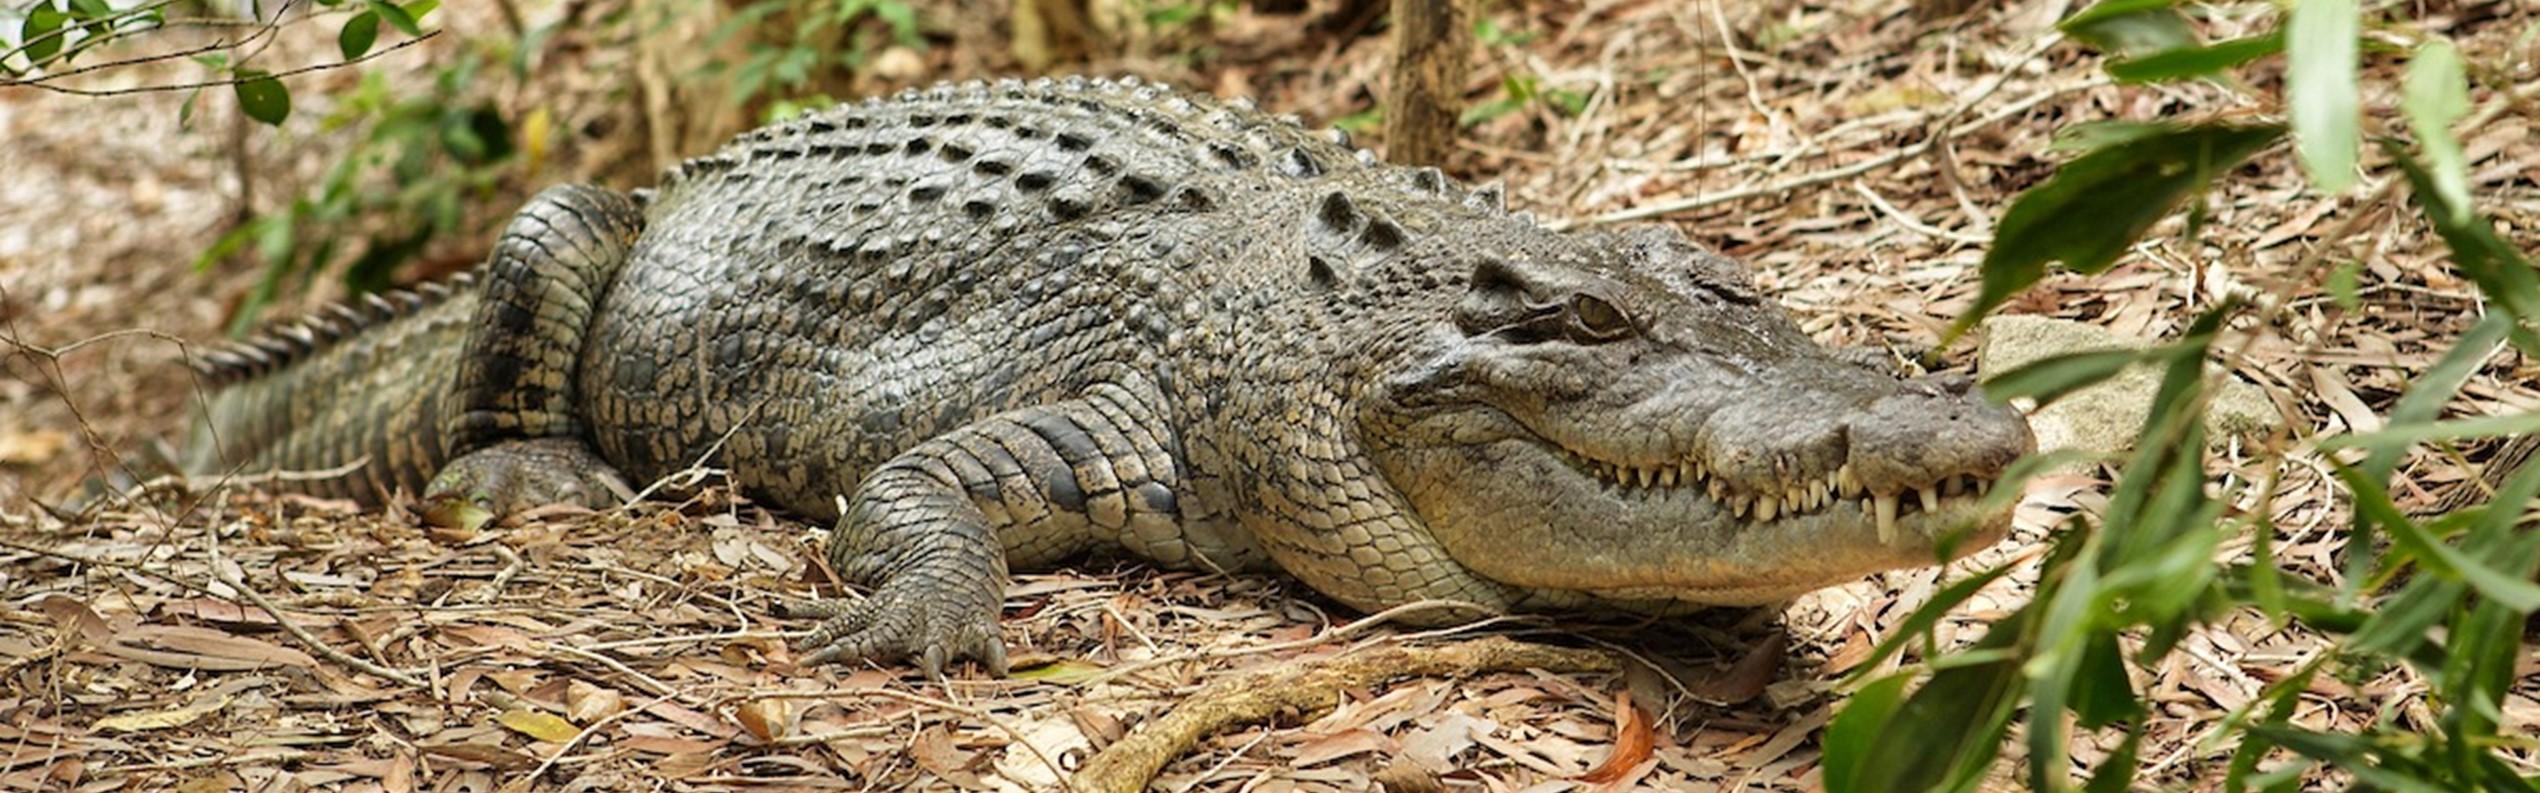 Saltwater Crocodile at Hartleys